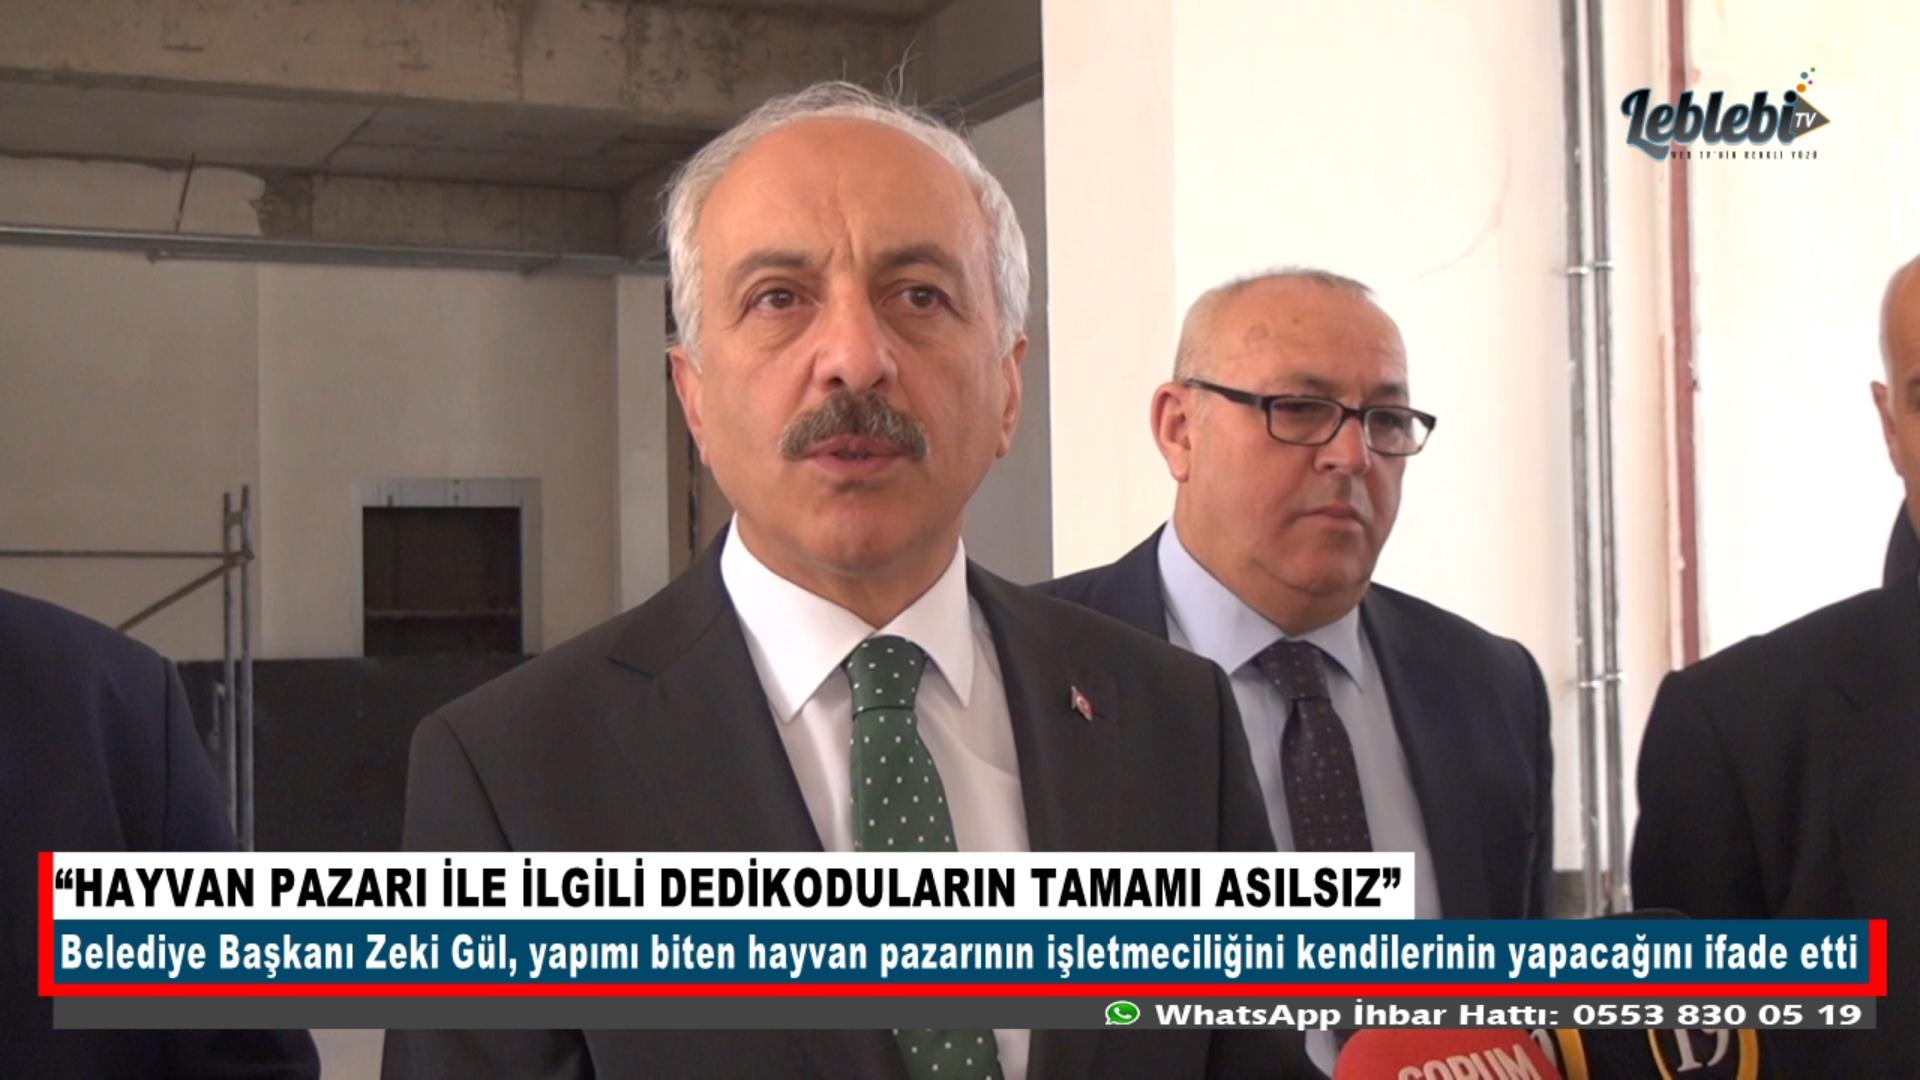 """HAYVAN PAZARI İLE İLGİLİ DEDİKODULARIN TAMAMI ASILSIZ"""